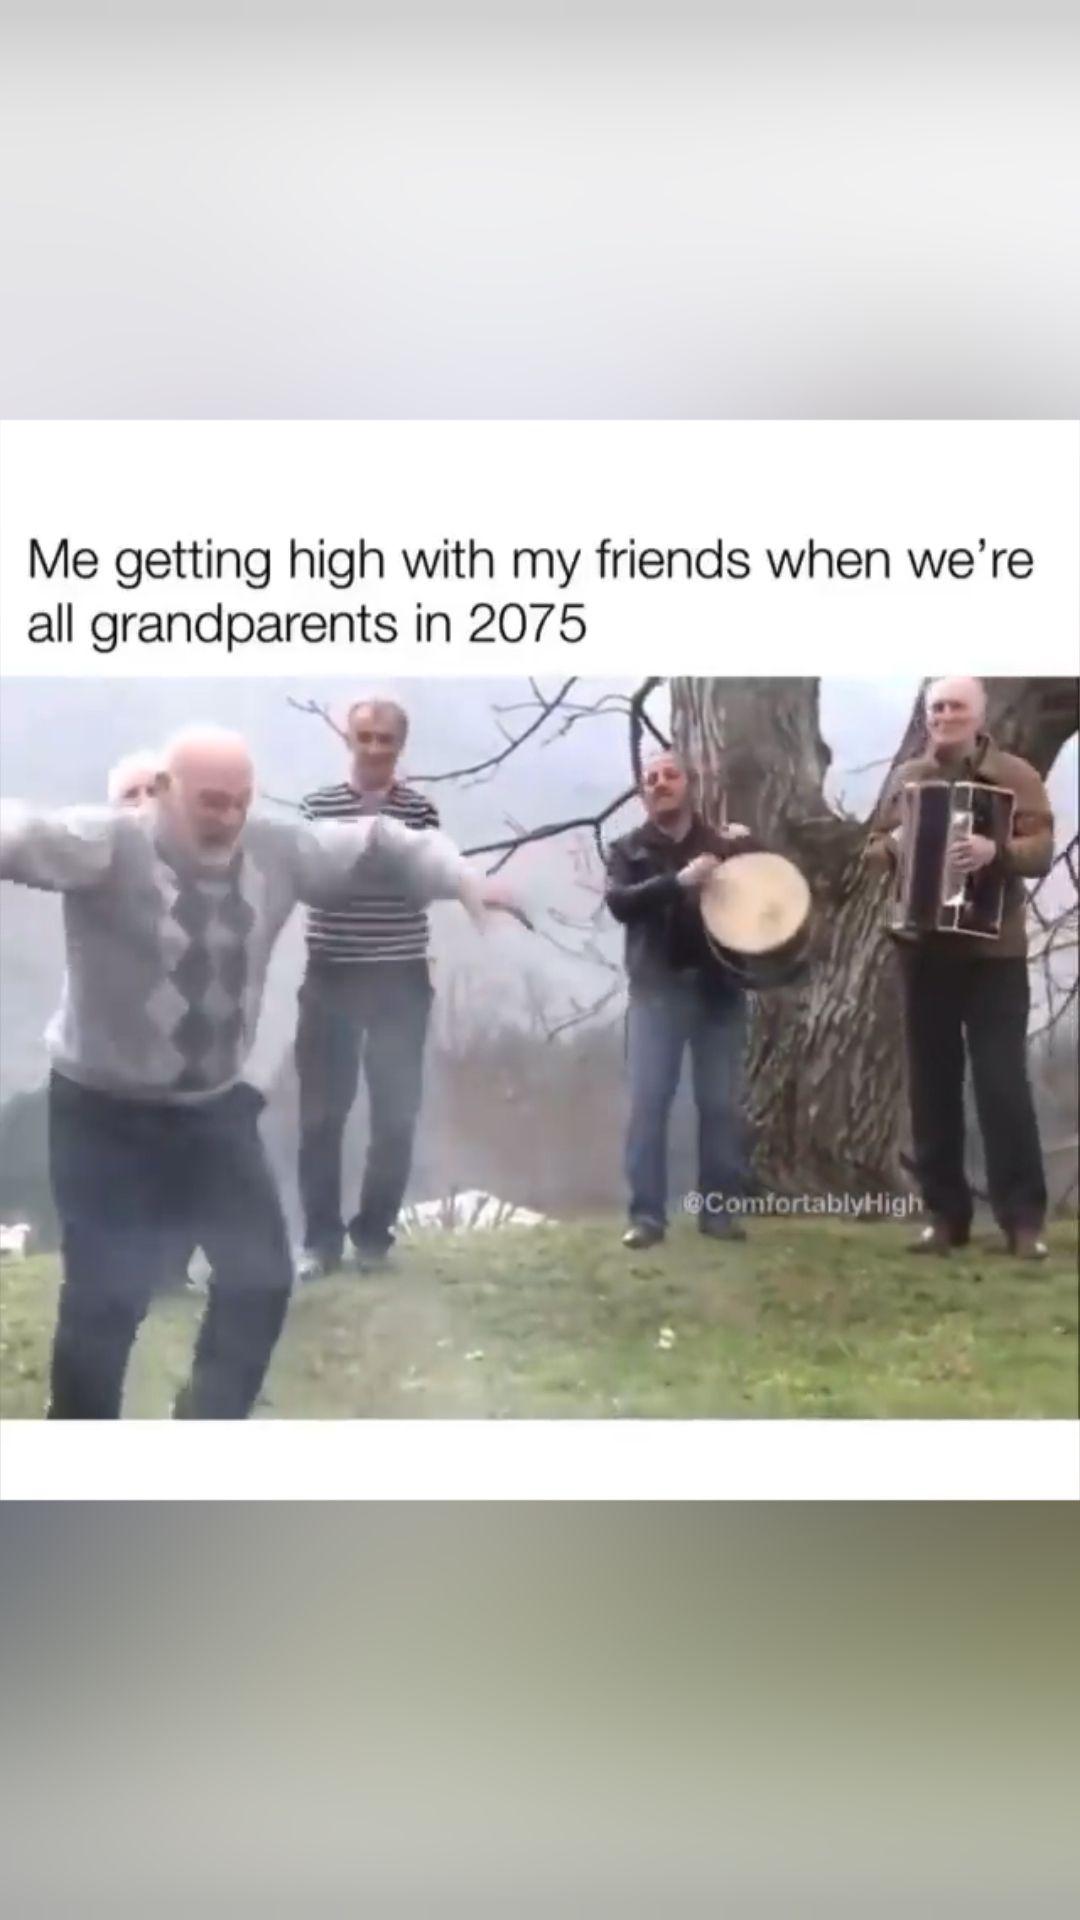 2075 it's on!!! 🔥🍃💨😂